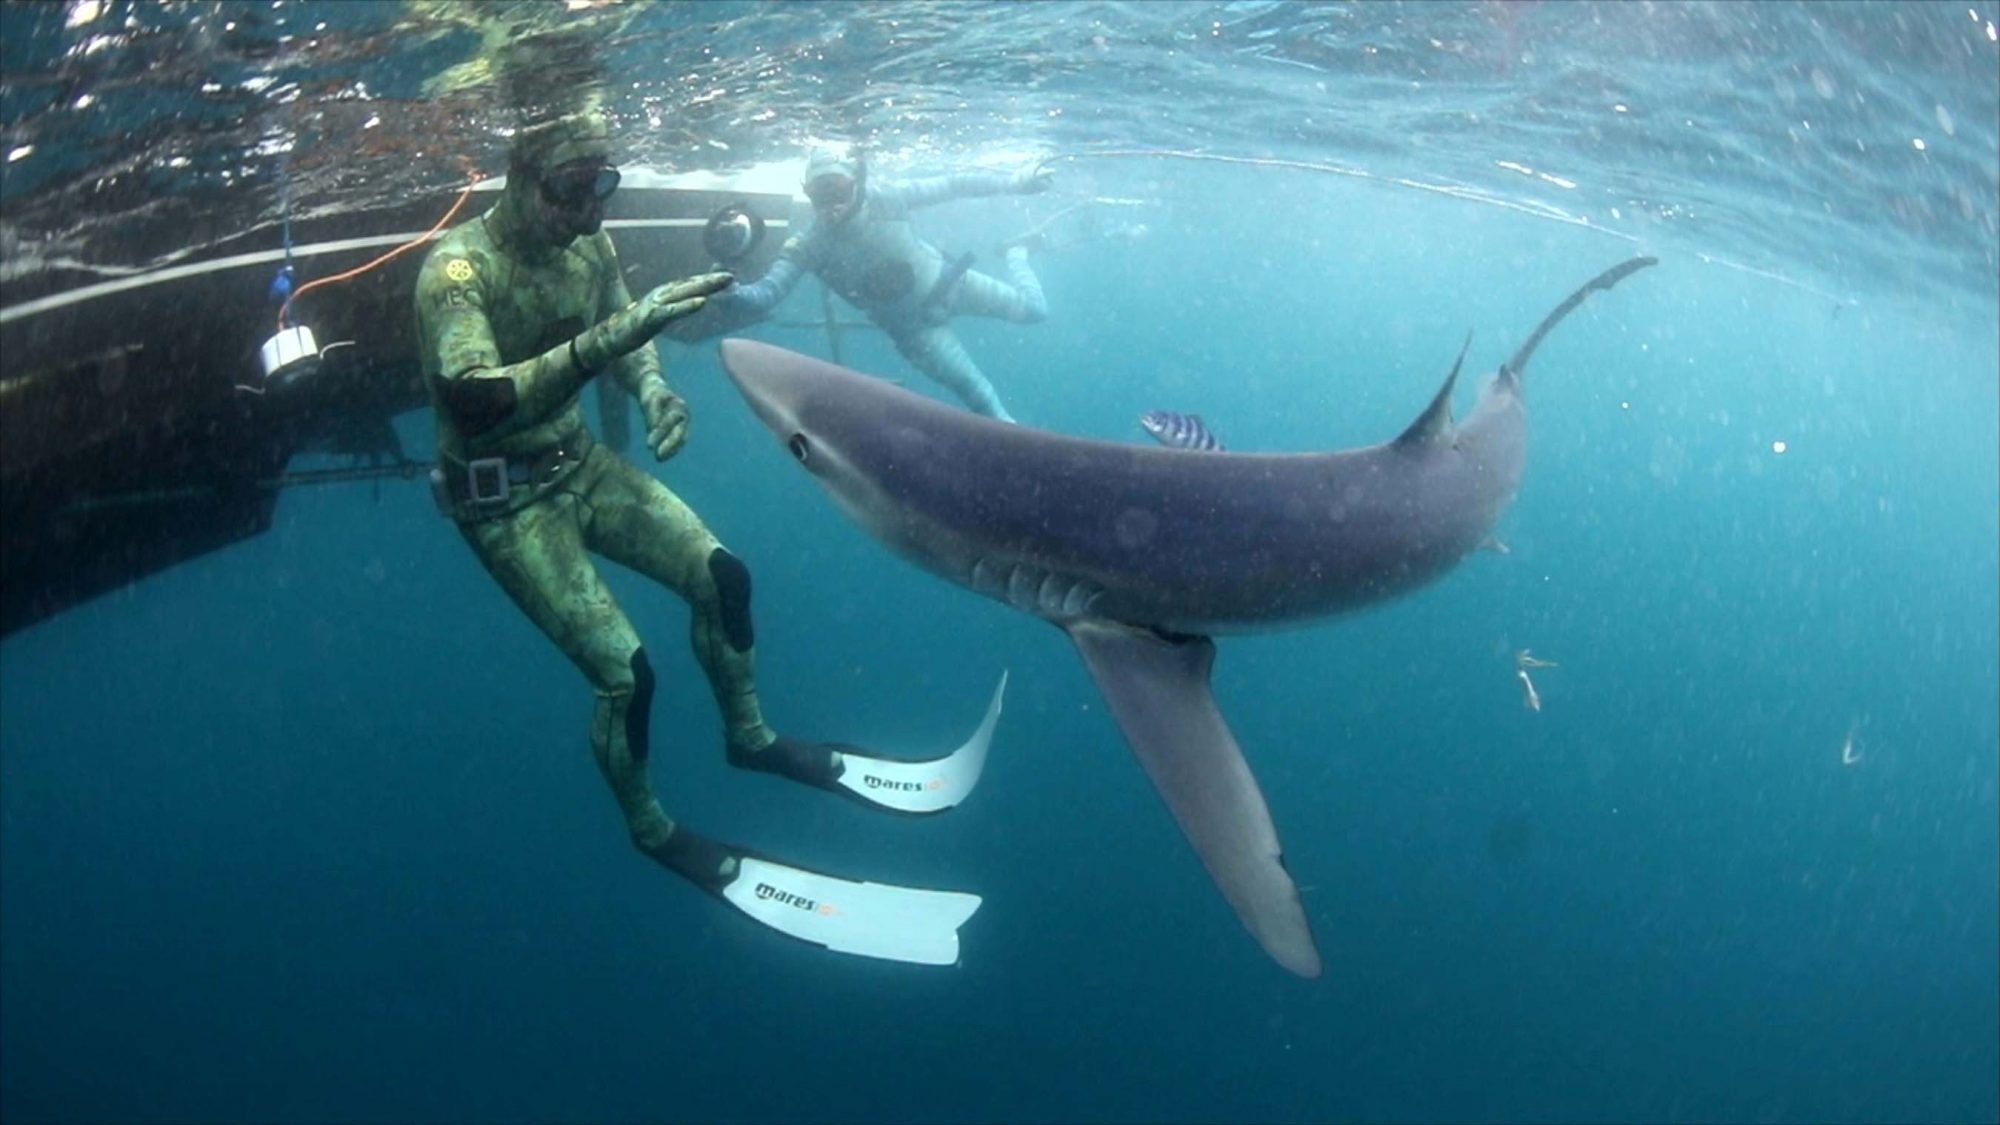 Monster Tag - Aaron Rodgers Underwater